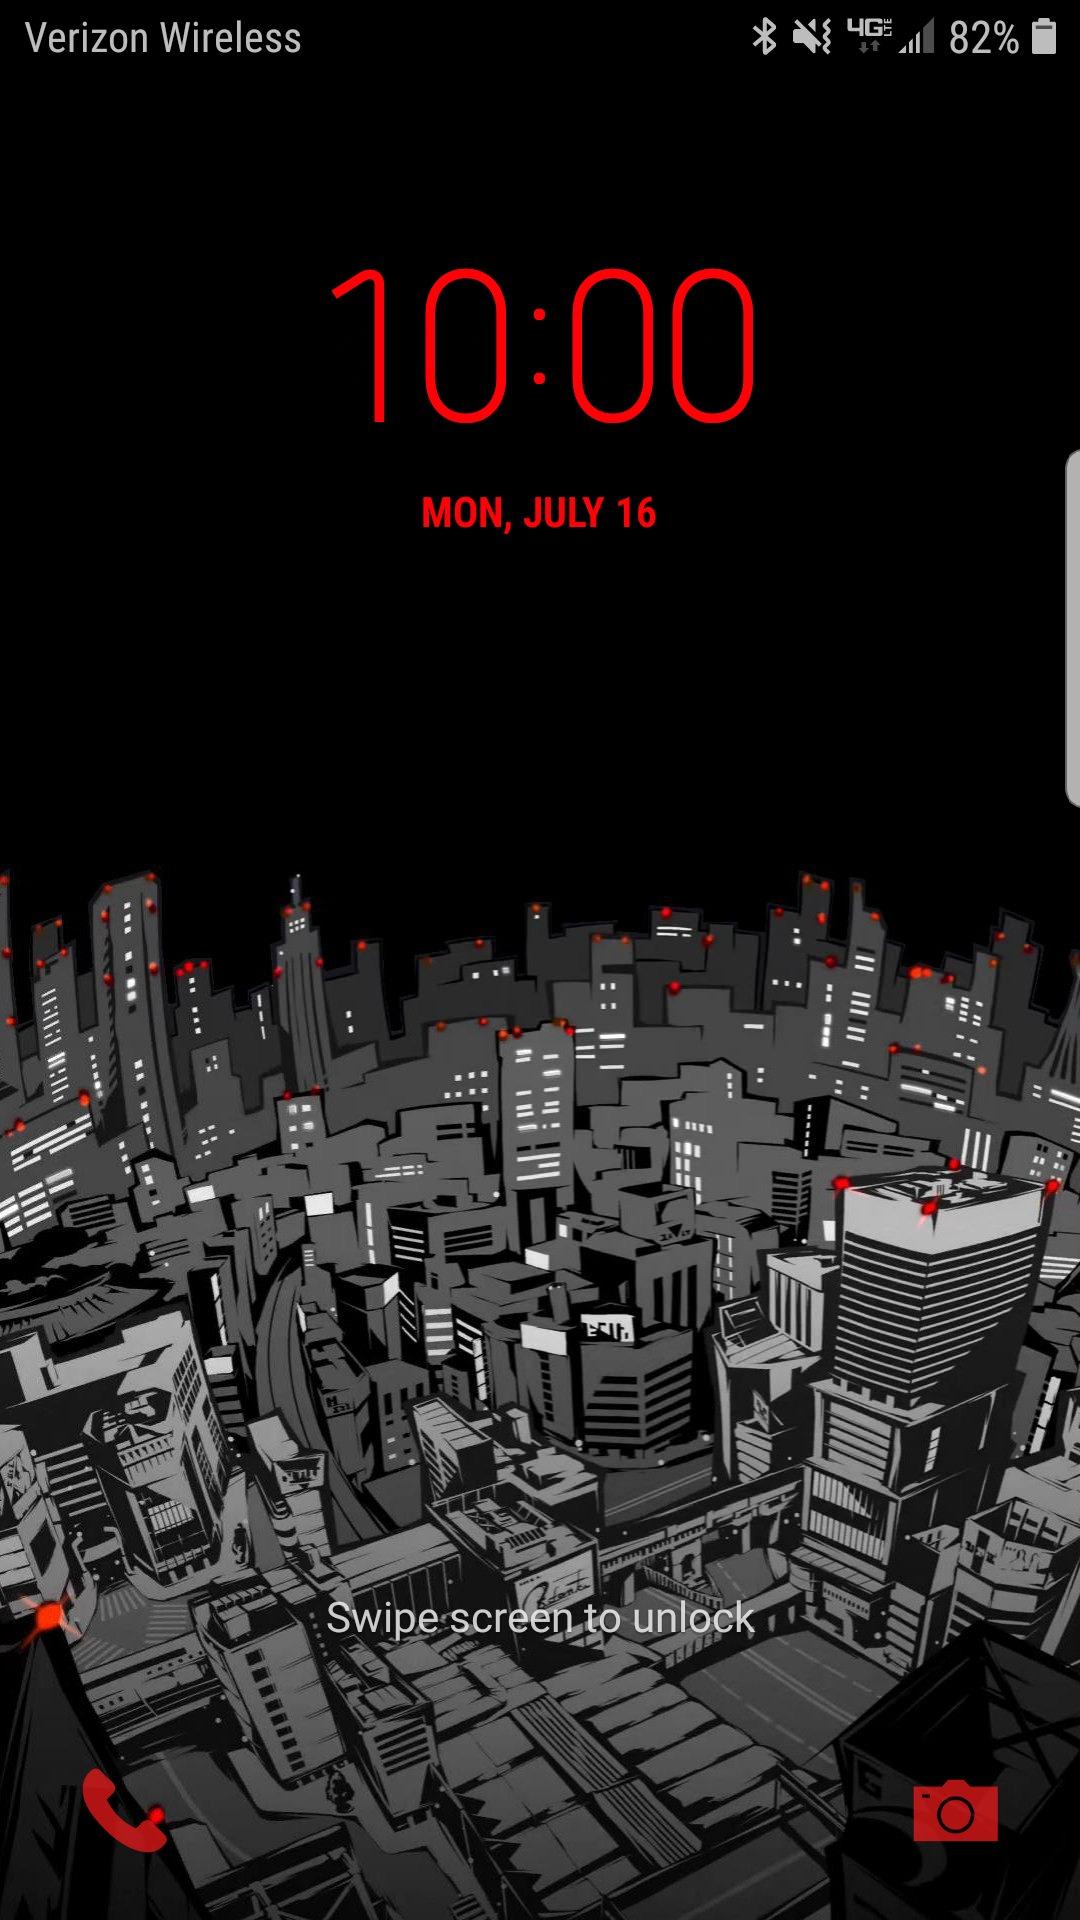 Persona 5 City Wallpaper Phone 1080x1920 Wallpaper Teahub Io